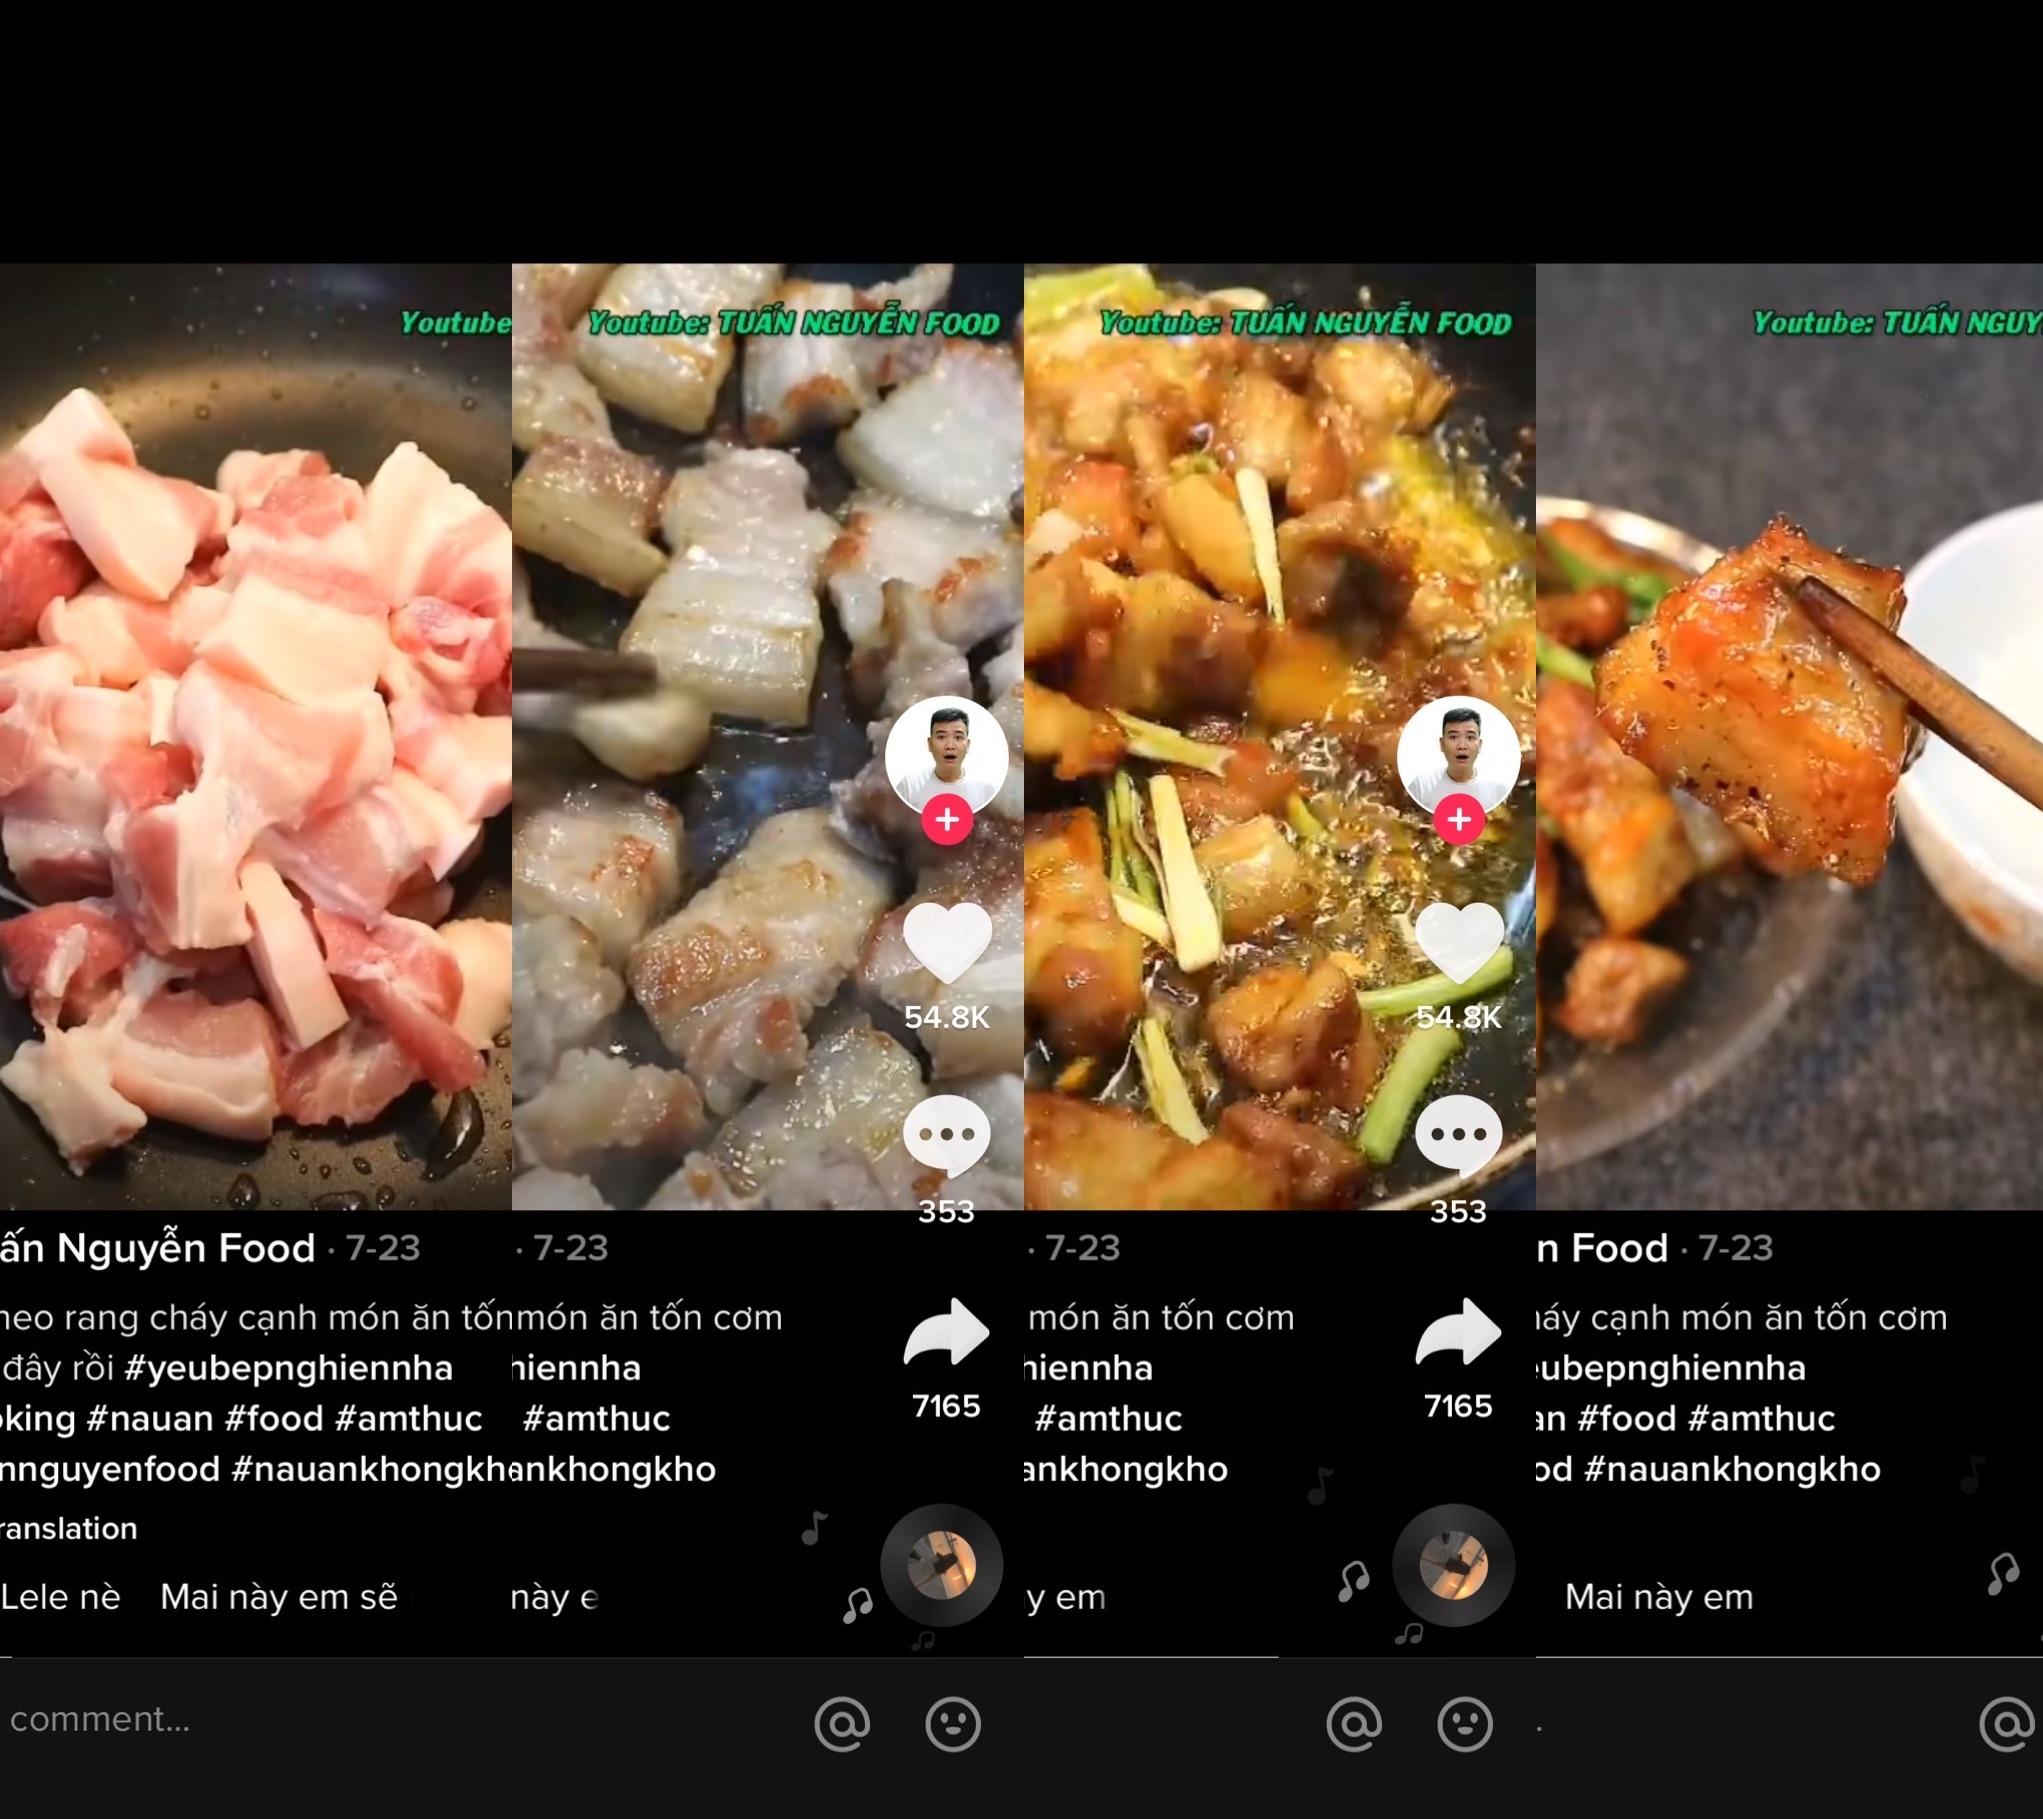 Cooking up viral videos: TikTok is social media's hottest new recipe platform